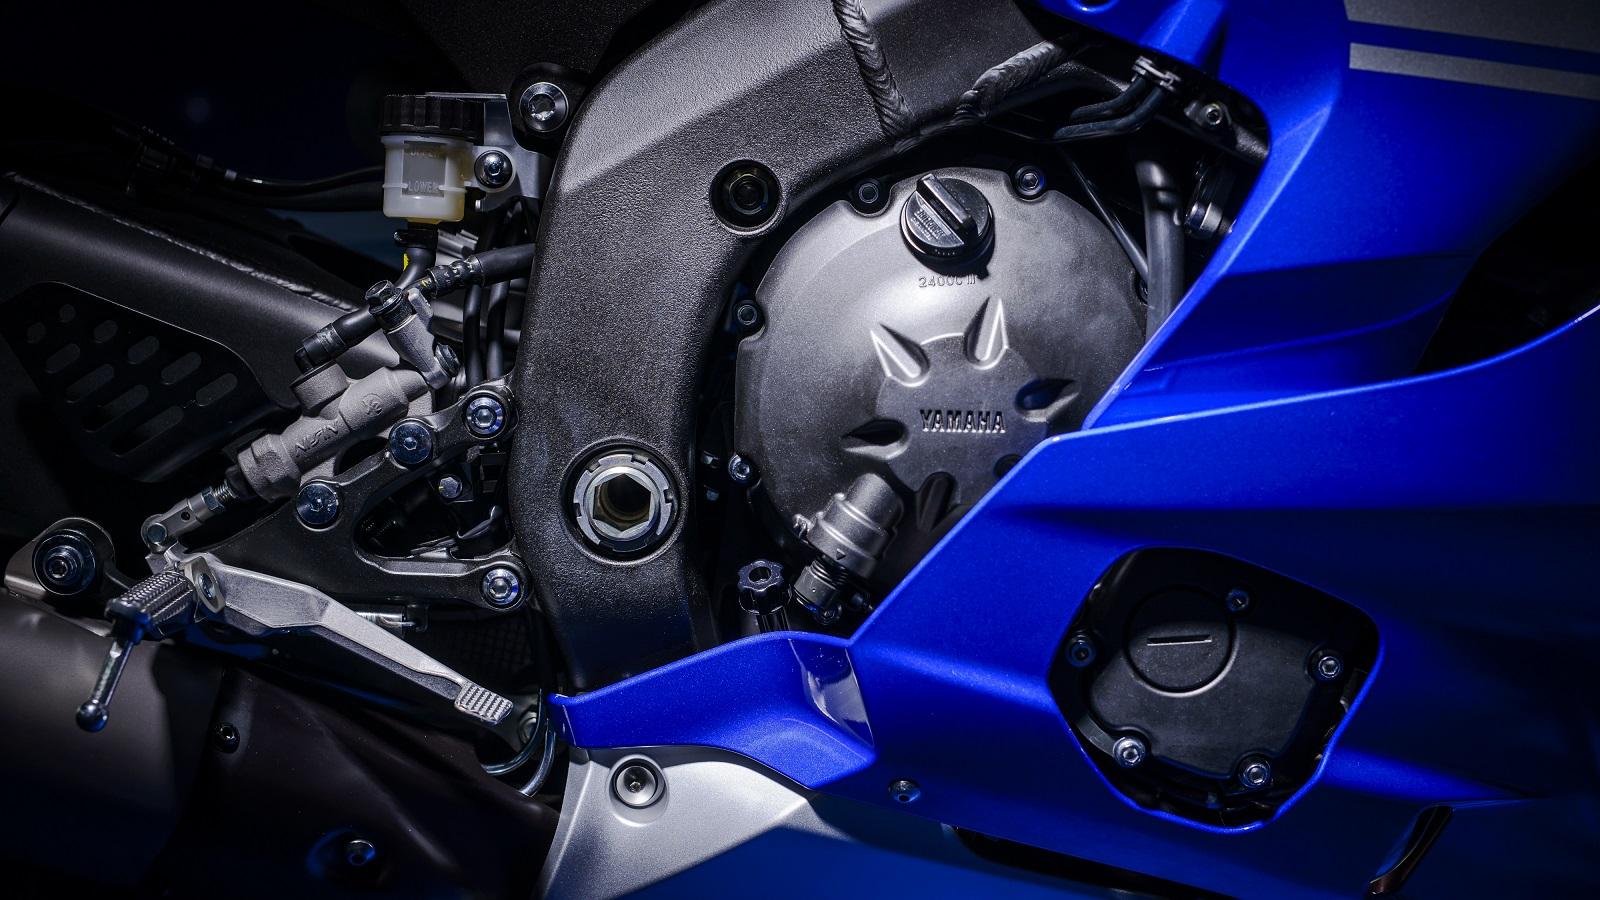 2017 Yamaha YZF-R6 engine